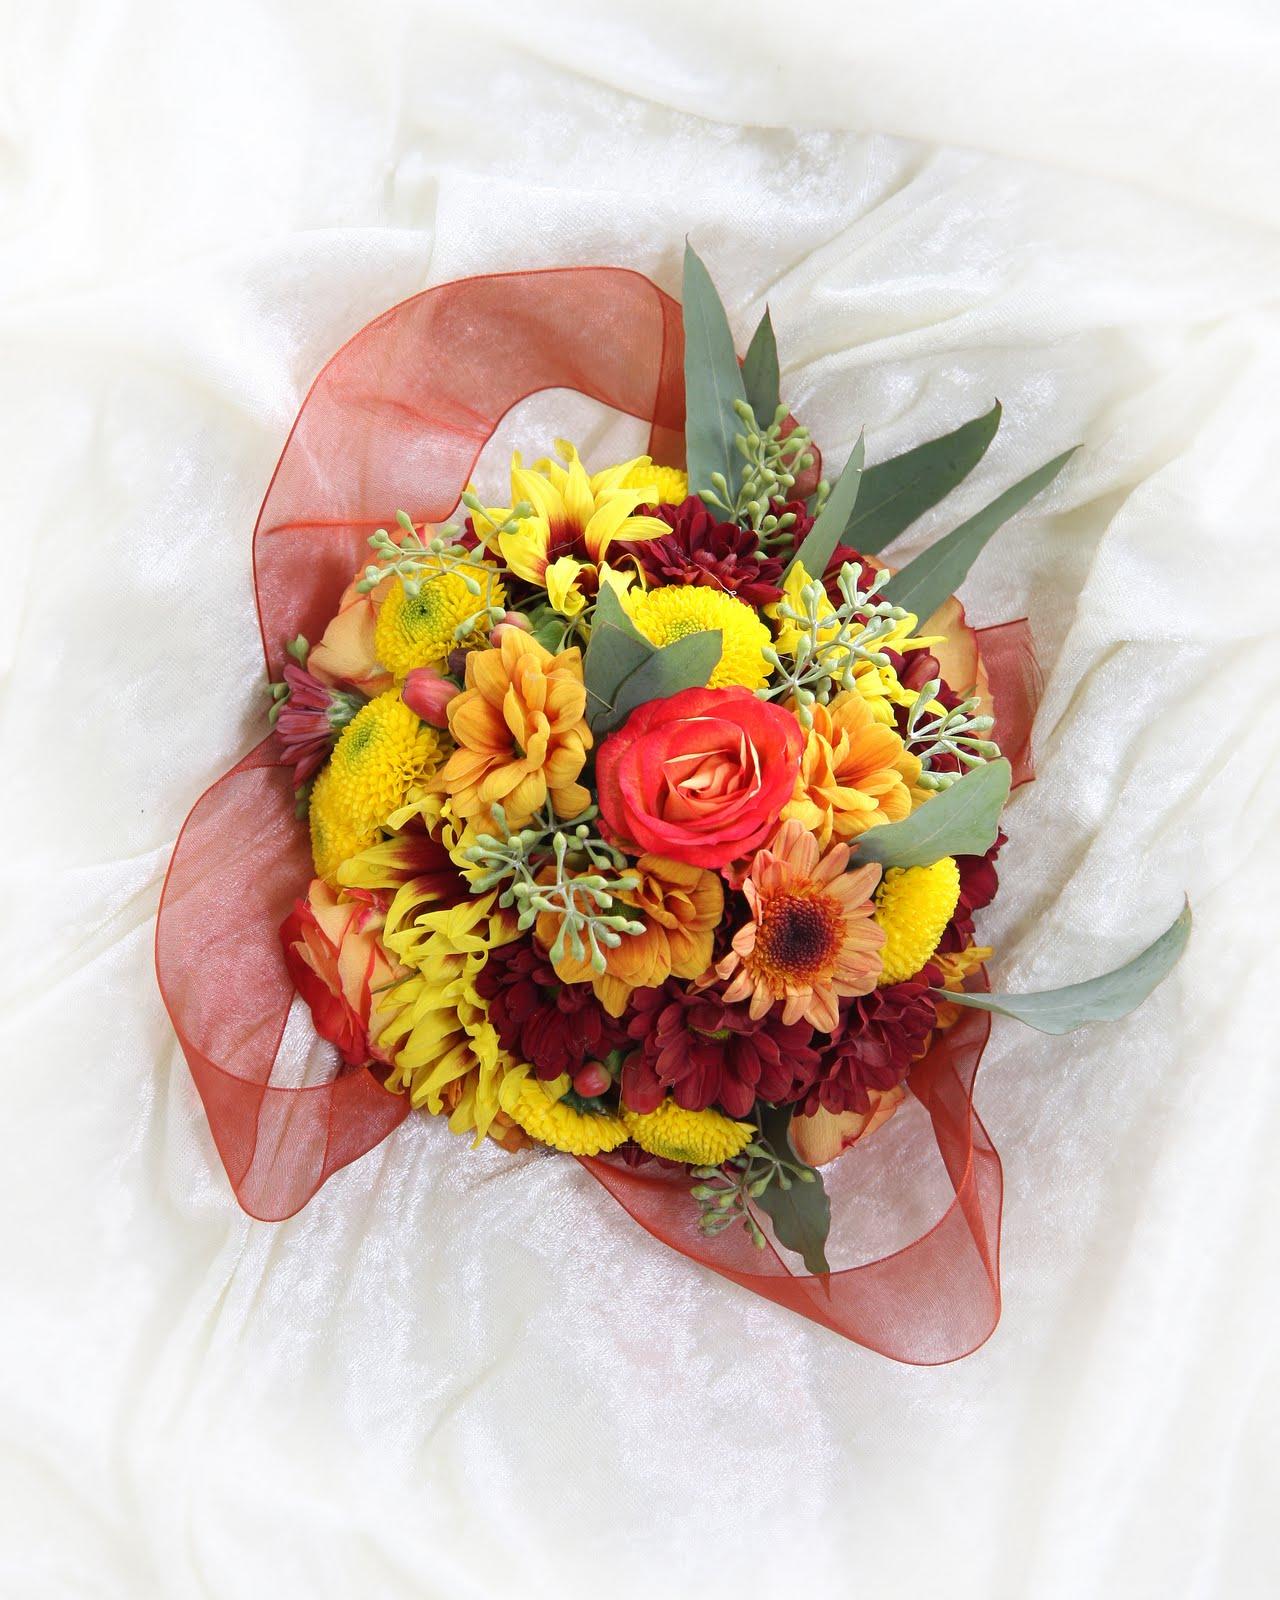 Edmonton Wedding Flowers: Edmonton Wedding Florist: Akiko Floral Artistry